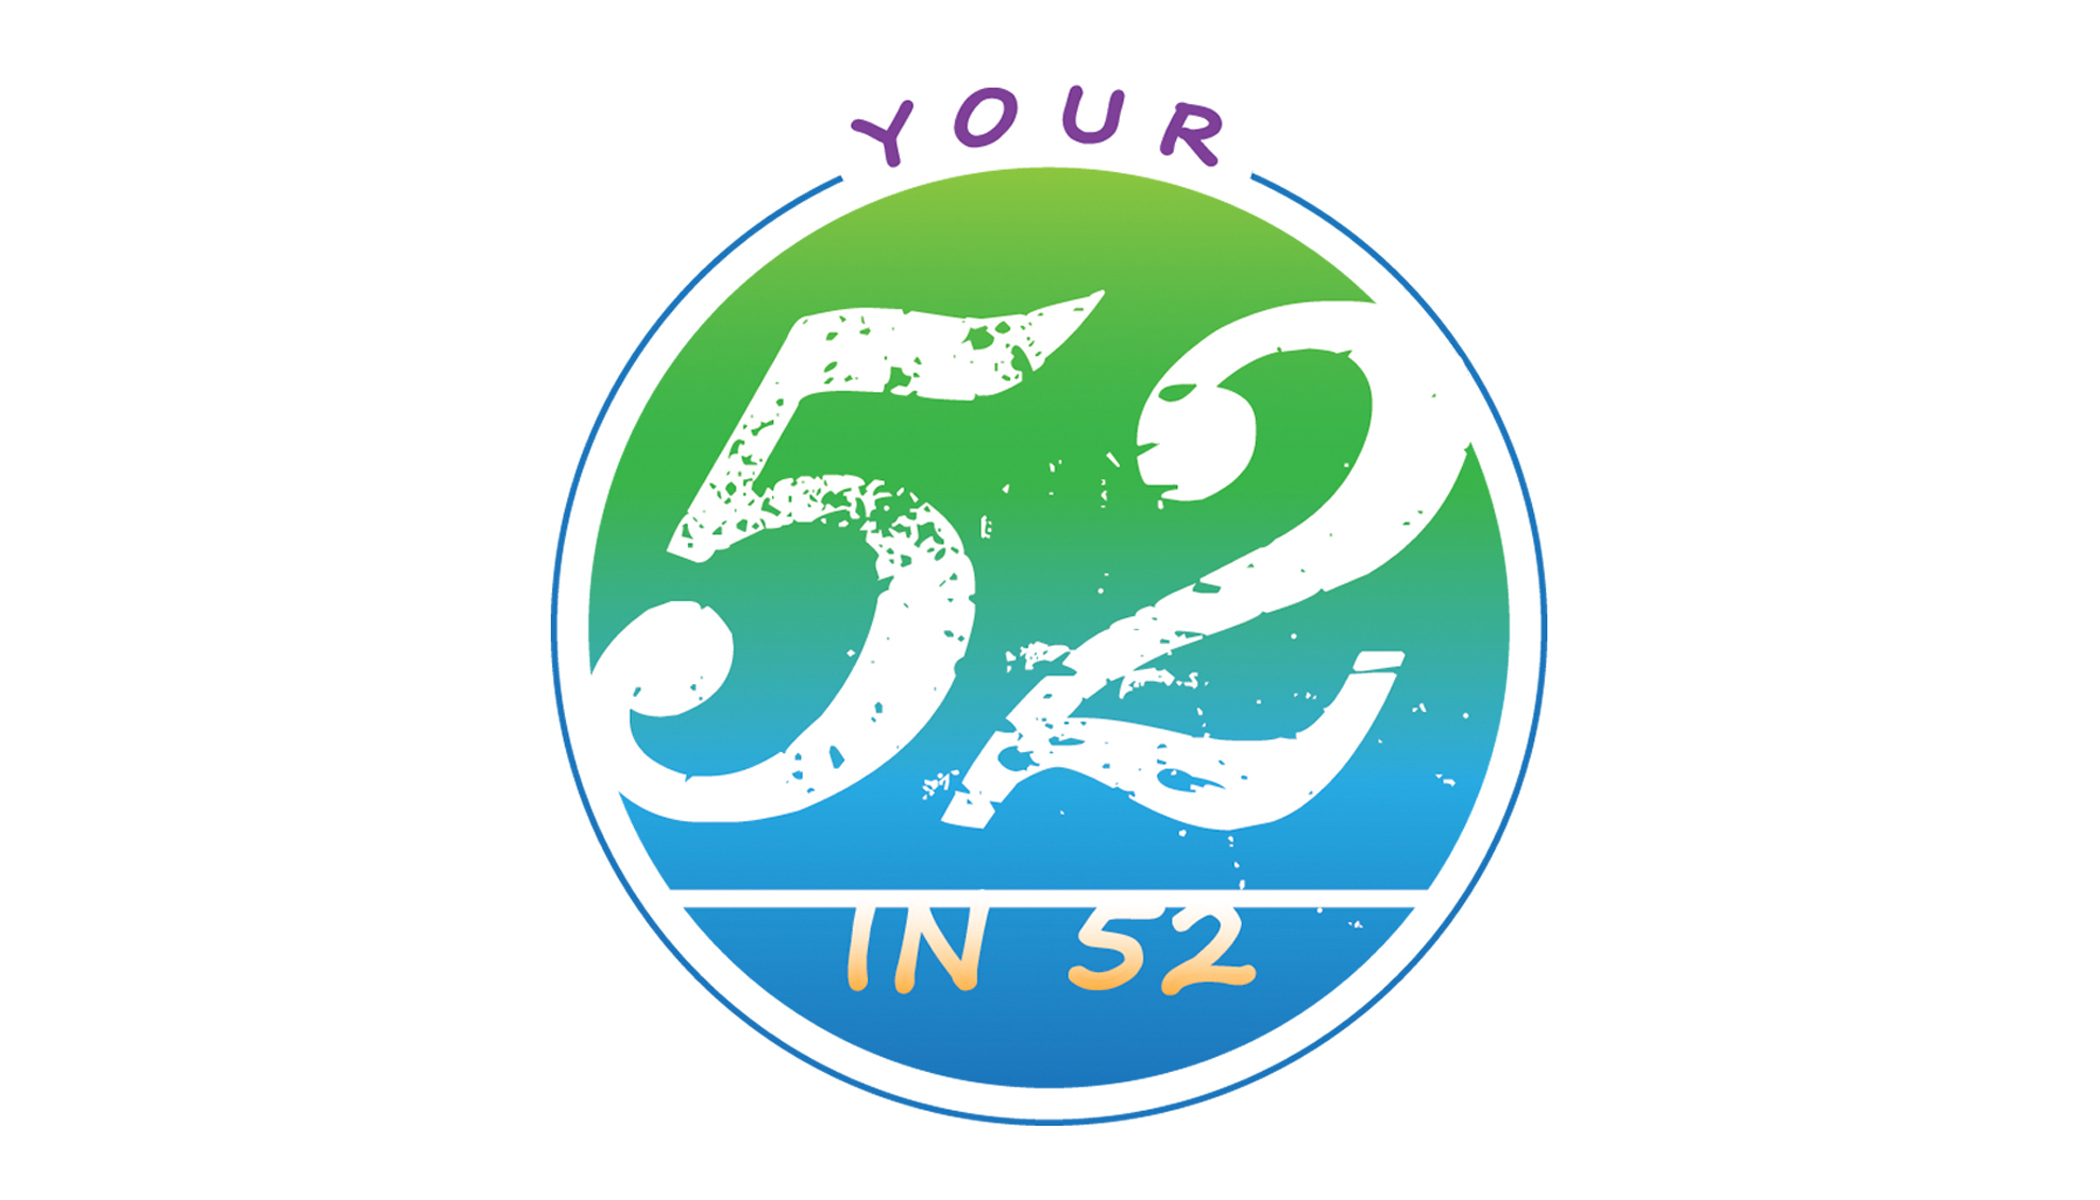 Your52in52_Logos.jpg